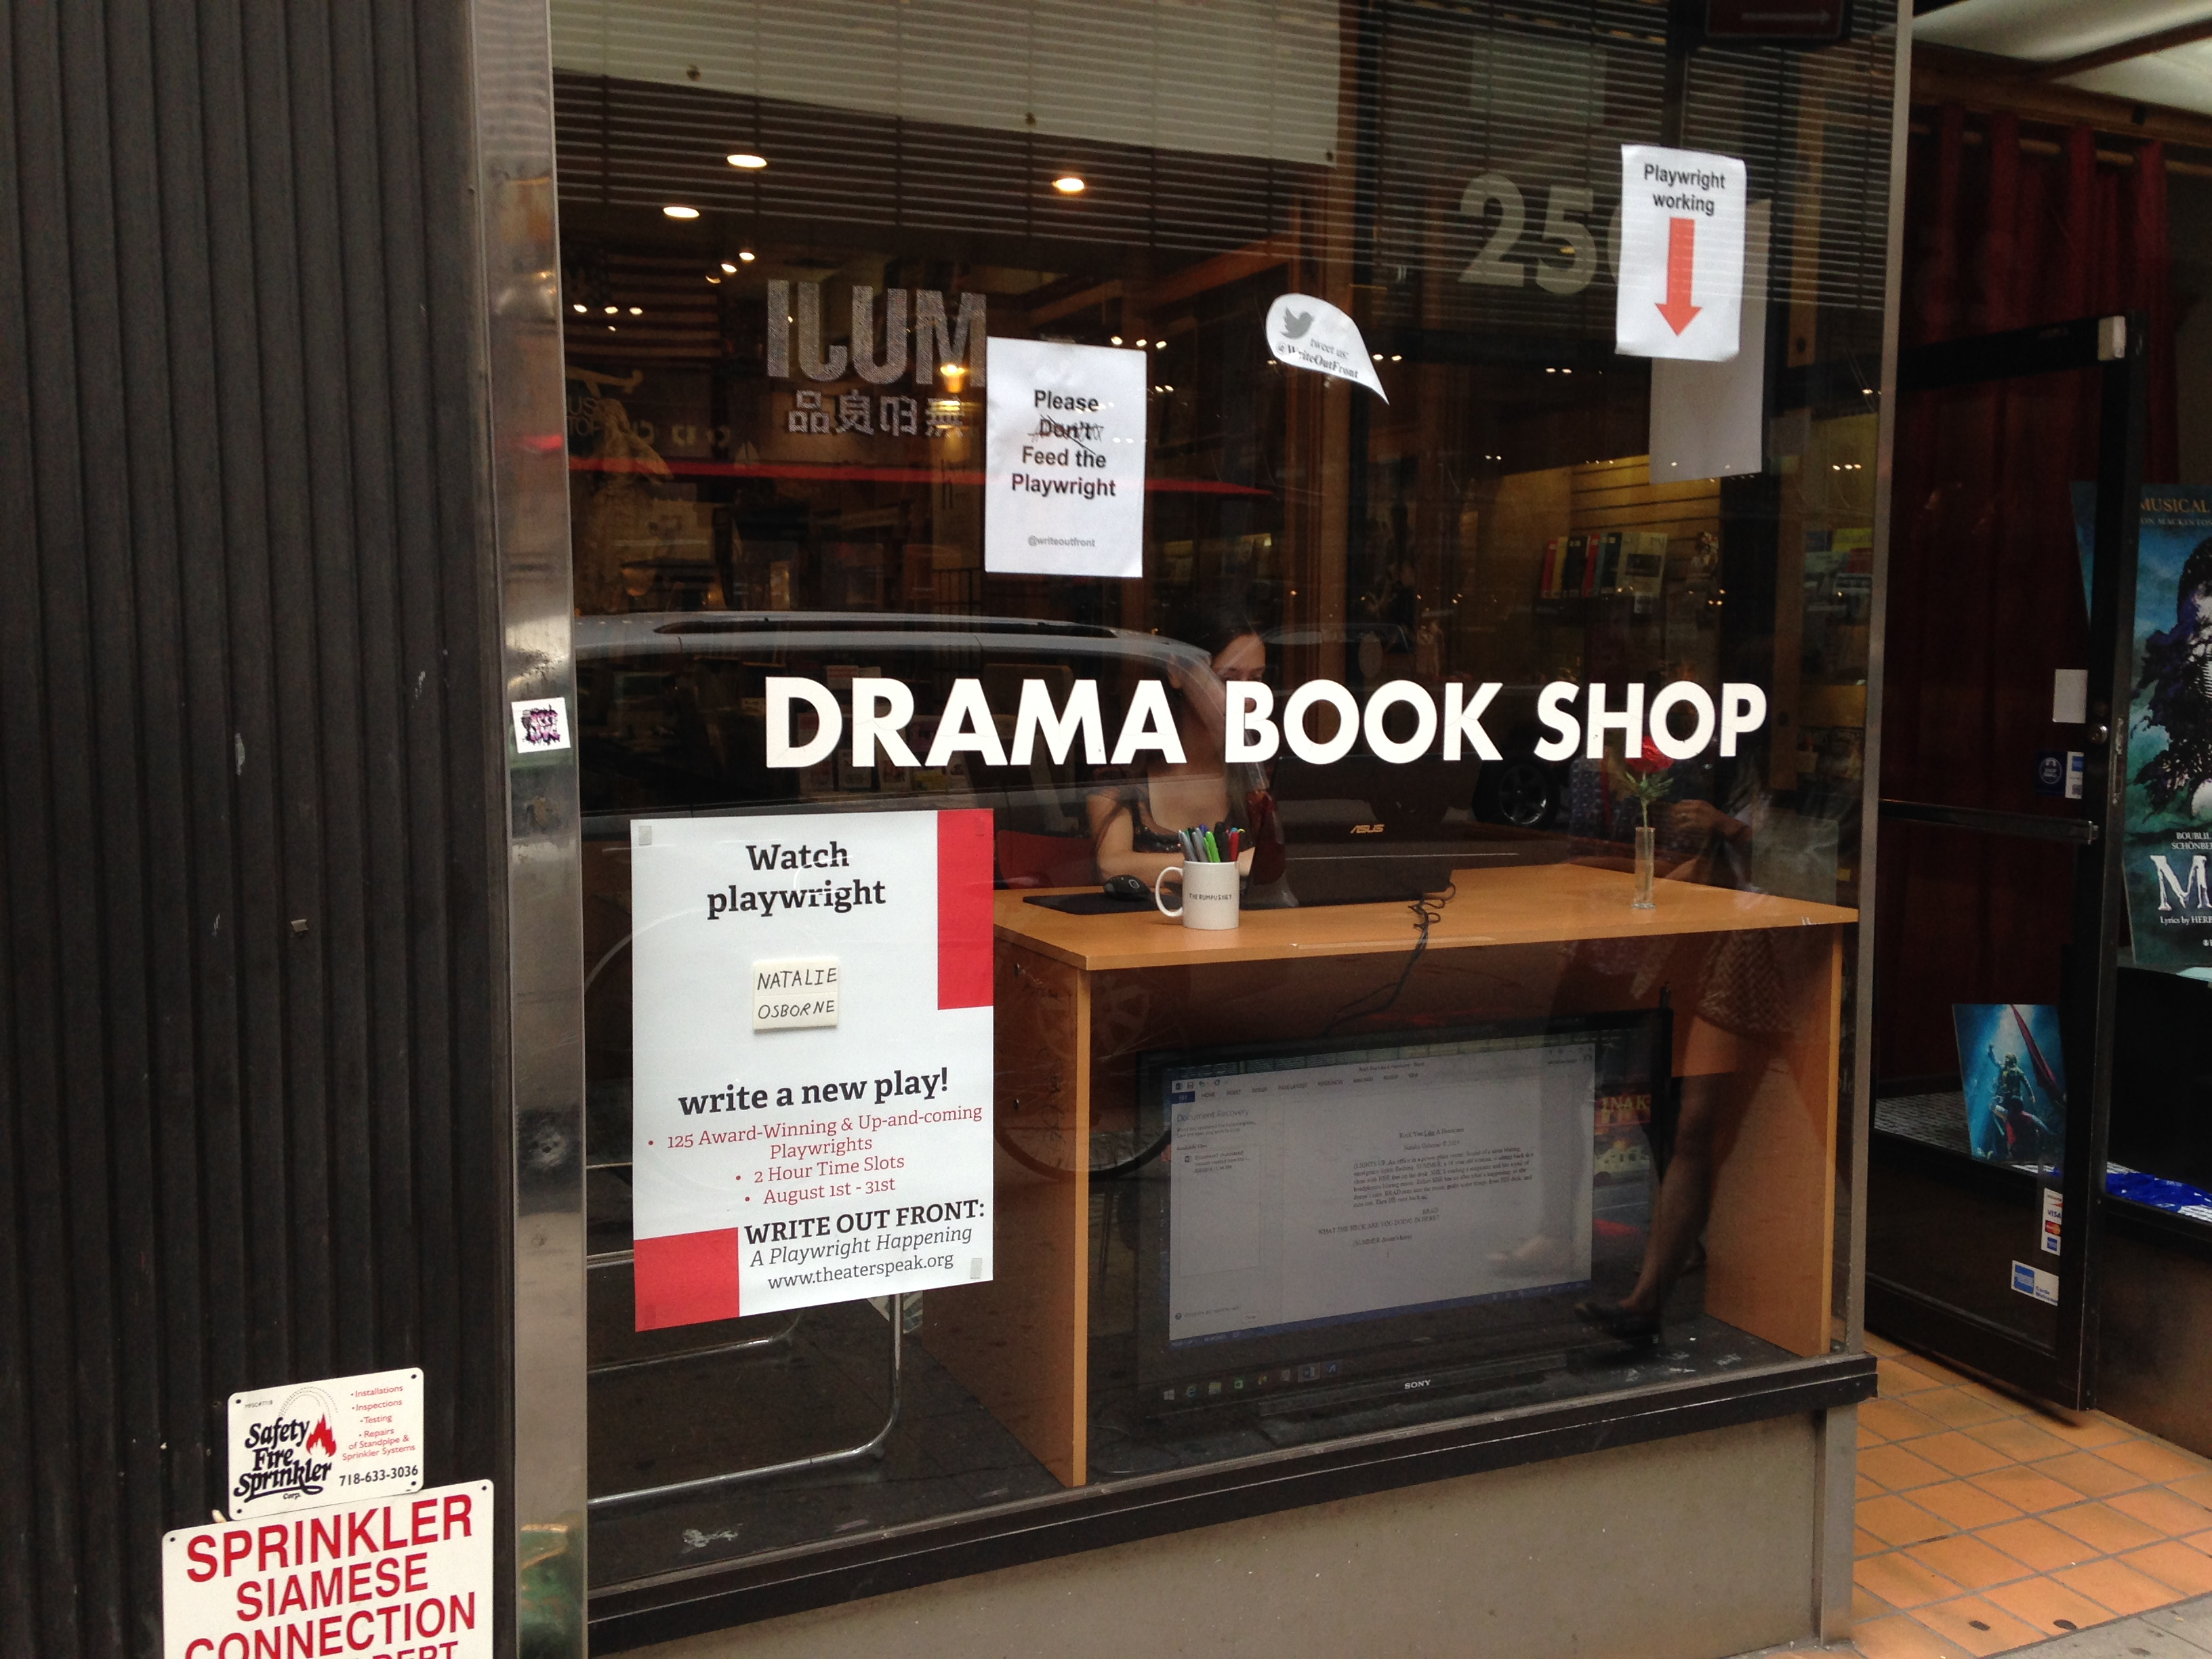 Drama Book Shop To Close After Rent Hike